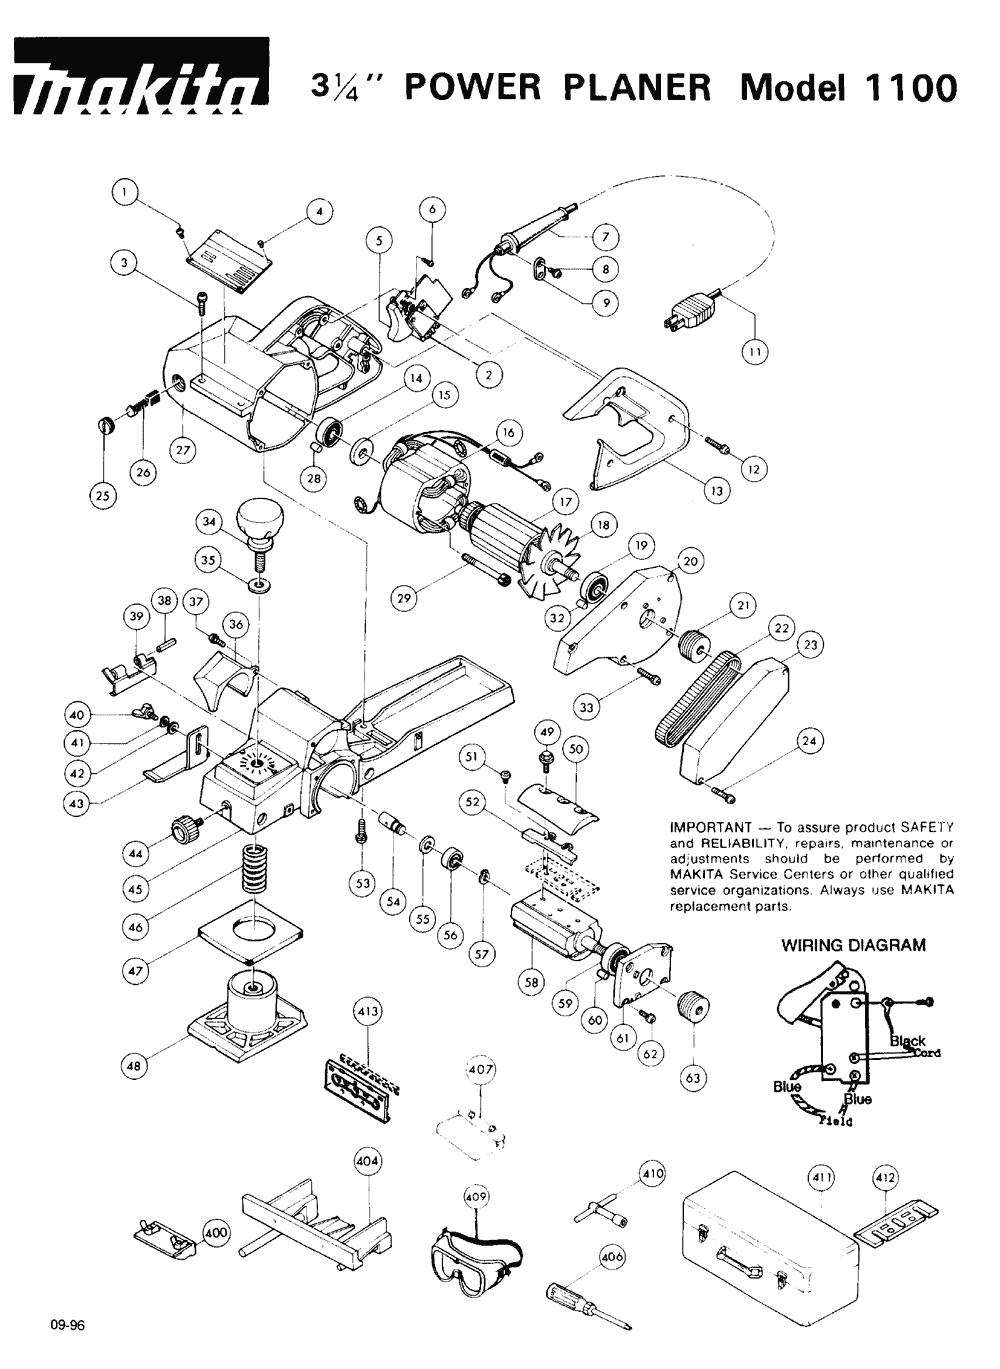 medium resolution of makita 1100 parts schematic